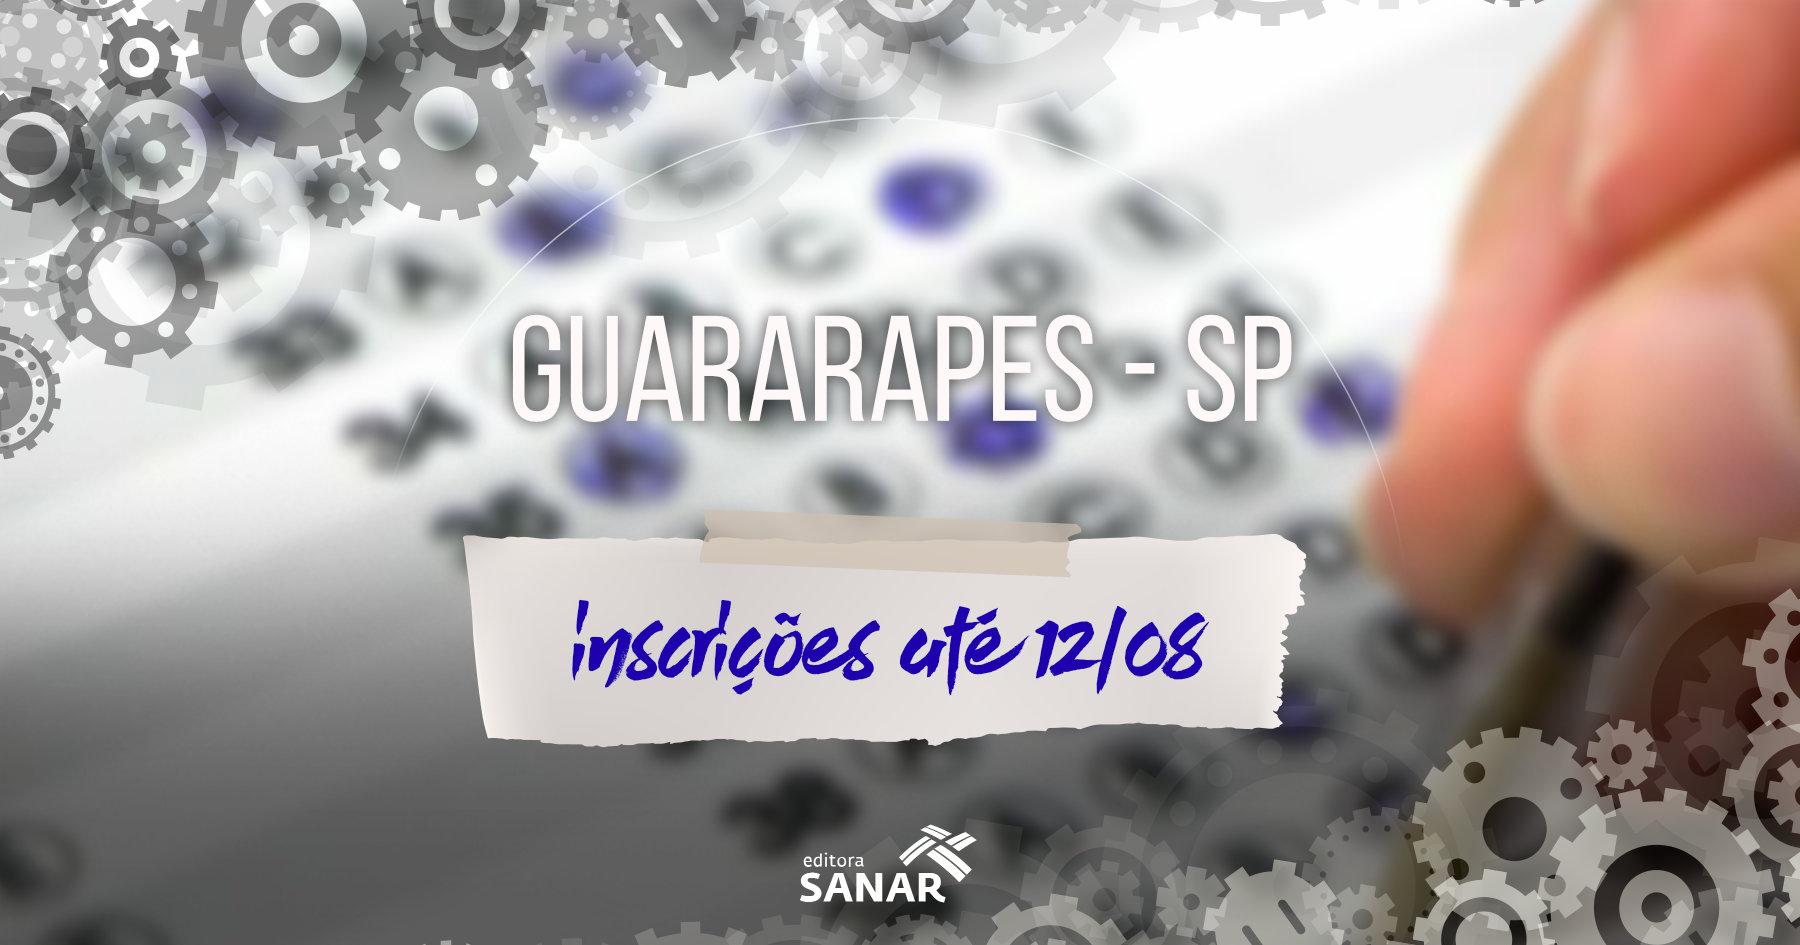 Concurso: Prefeitura de Guararapes divulga edital